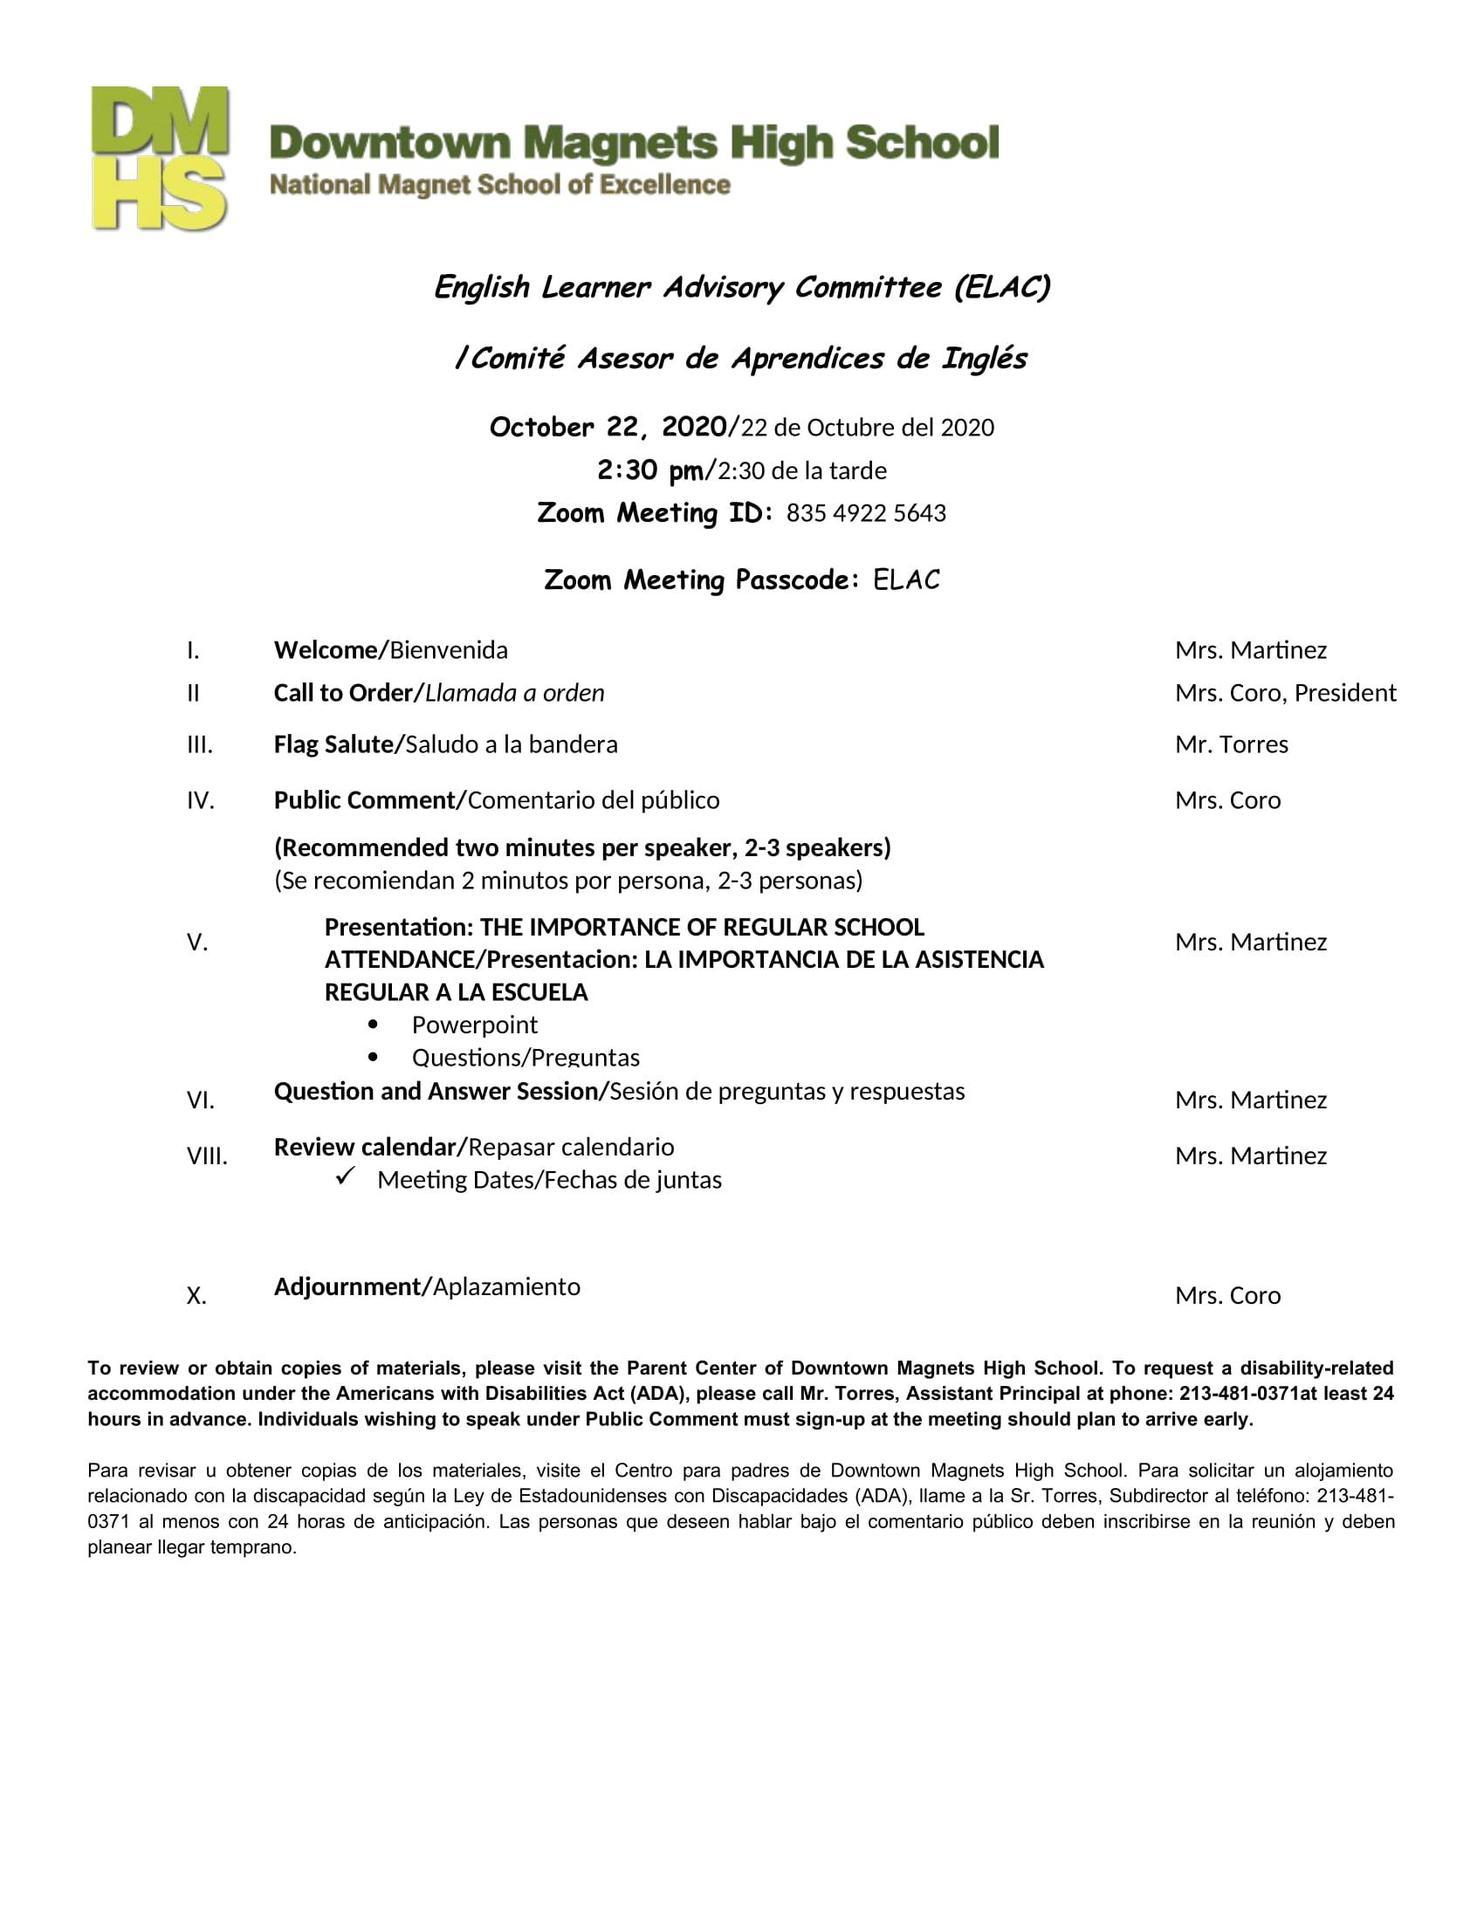 ELAC Agenda October 21, 2020